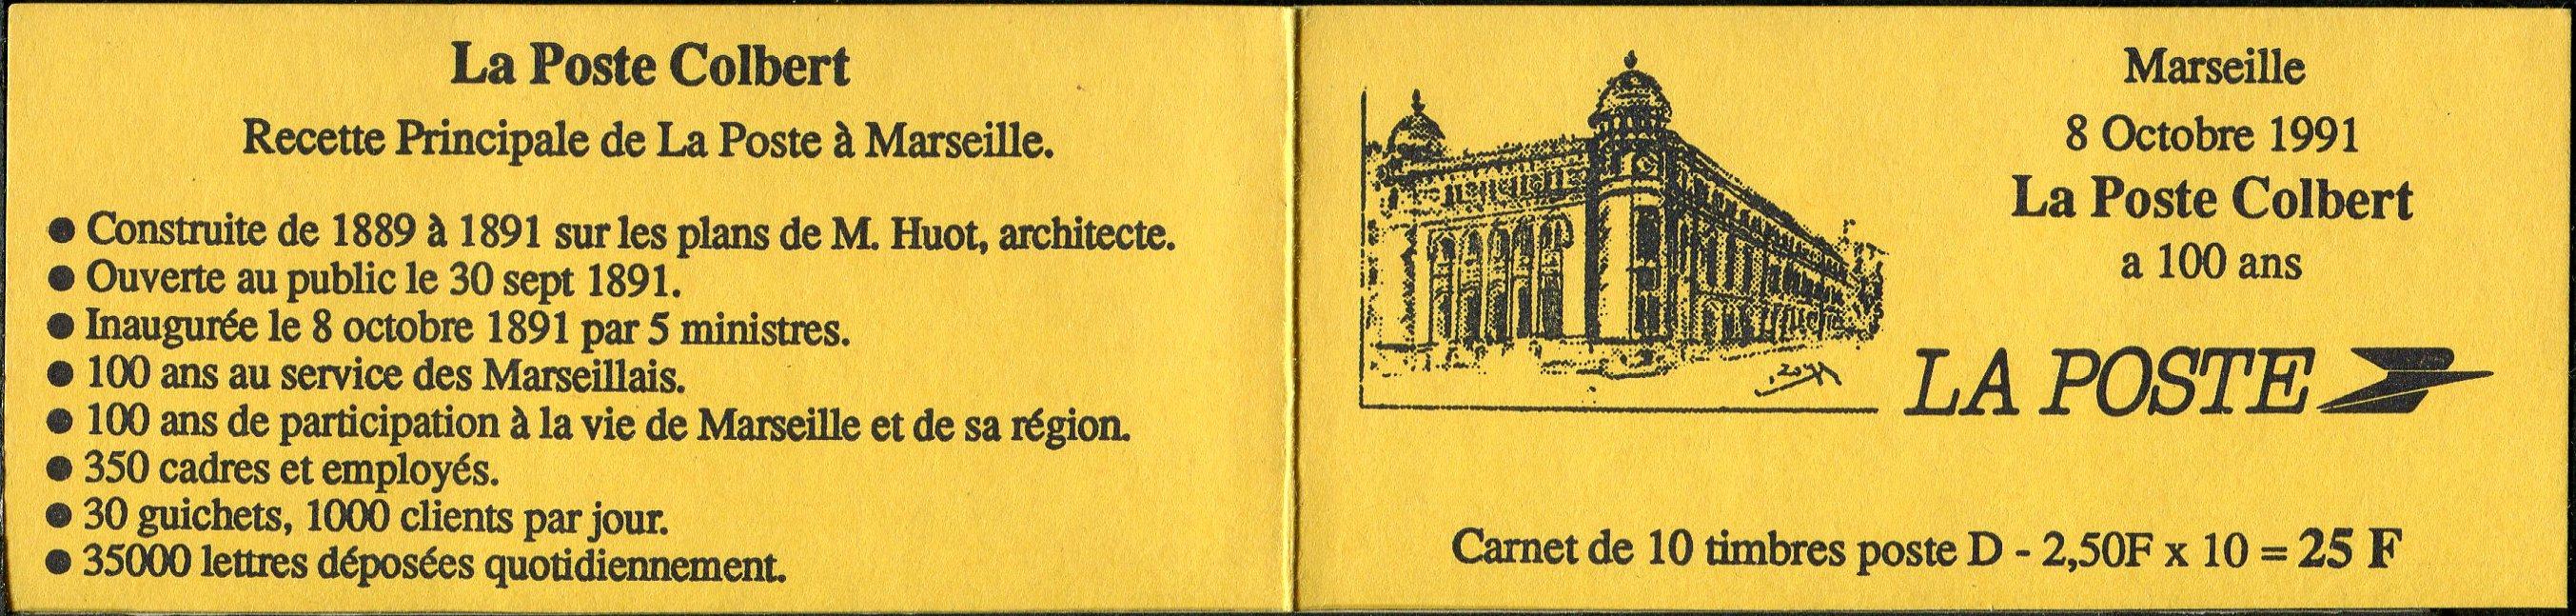 2712-CP1 - ACCP 600 - Carnet de 10 timbres - Tirage de la Poste de Colbert